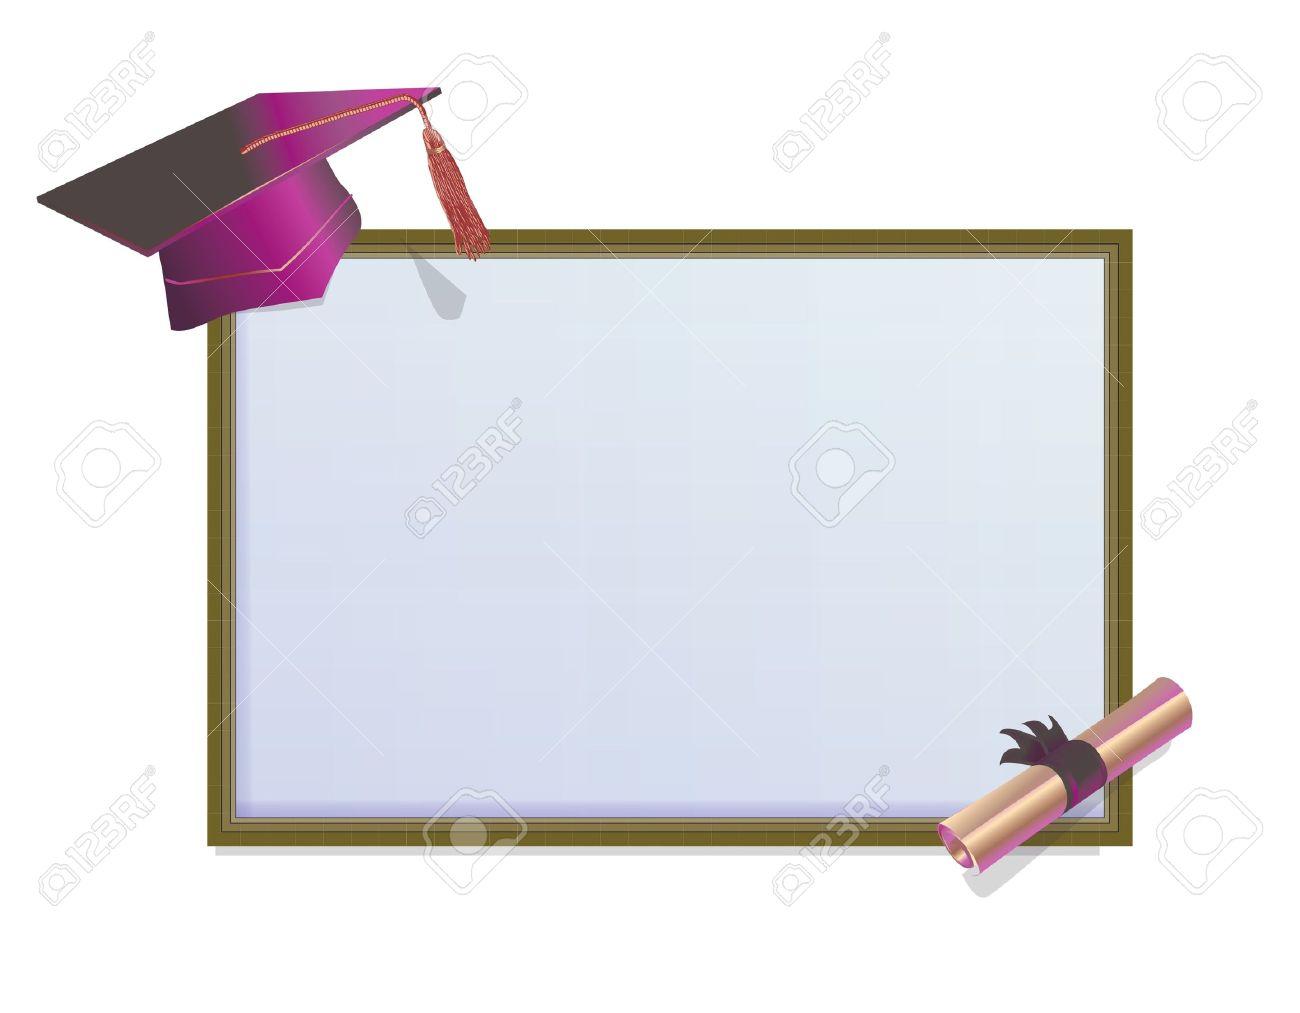 Graduation invitation card with mortars royalty free cliparts graduation invitation card with mortars stock vector 18711096 stopboris Gallery